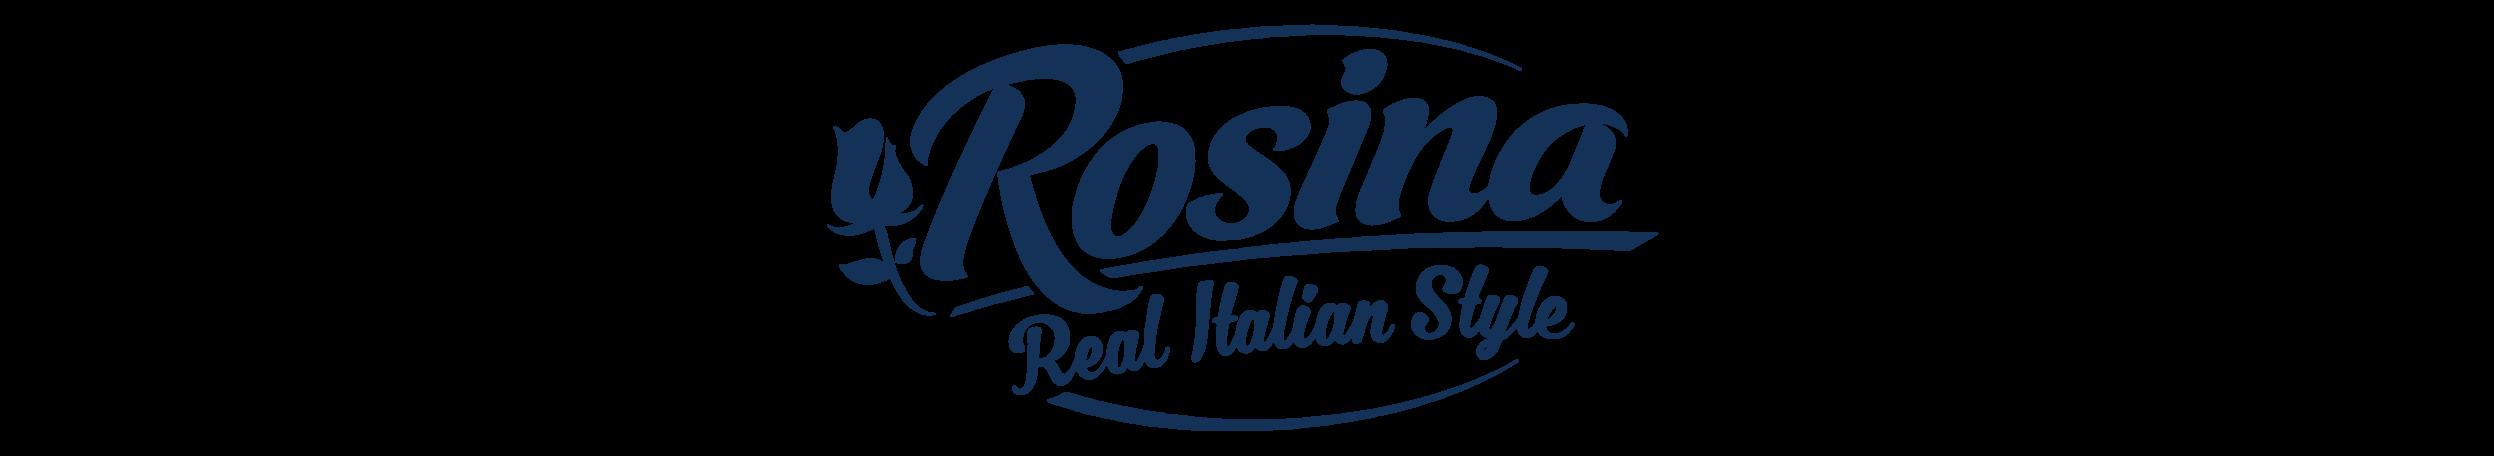 Rosina Italian Food Testimonial.png